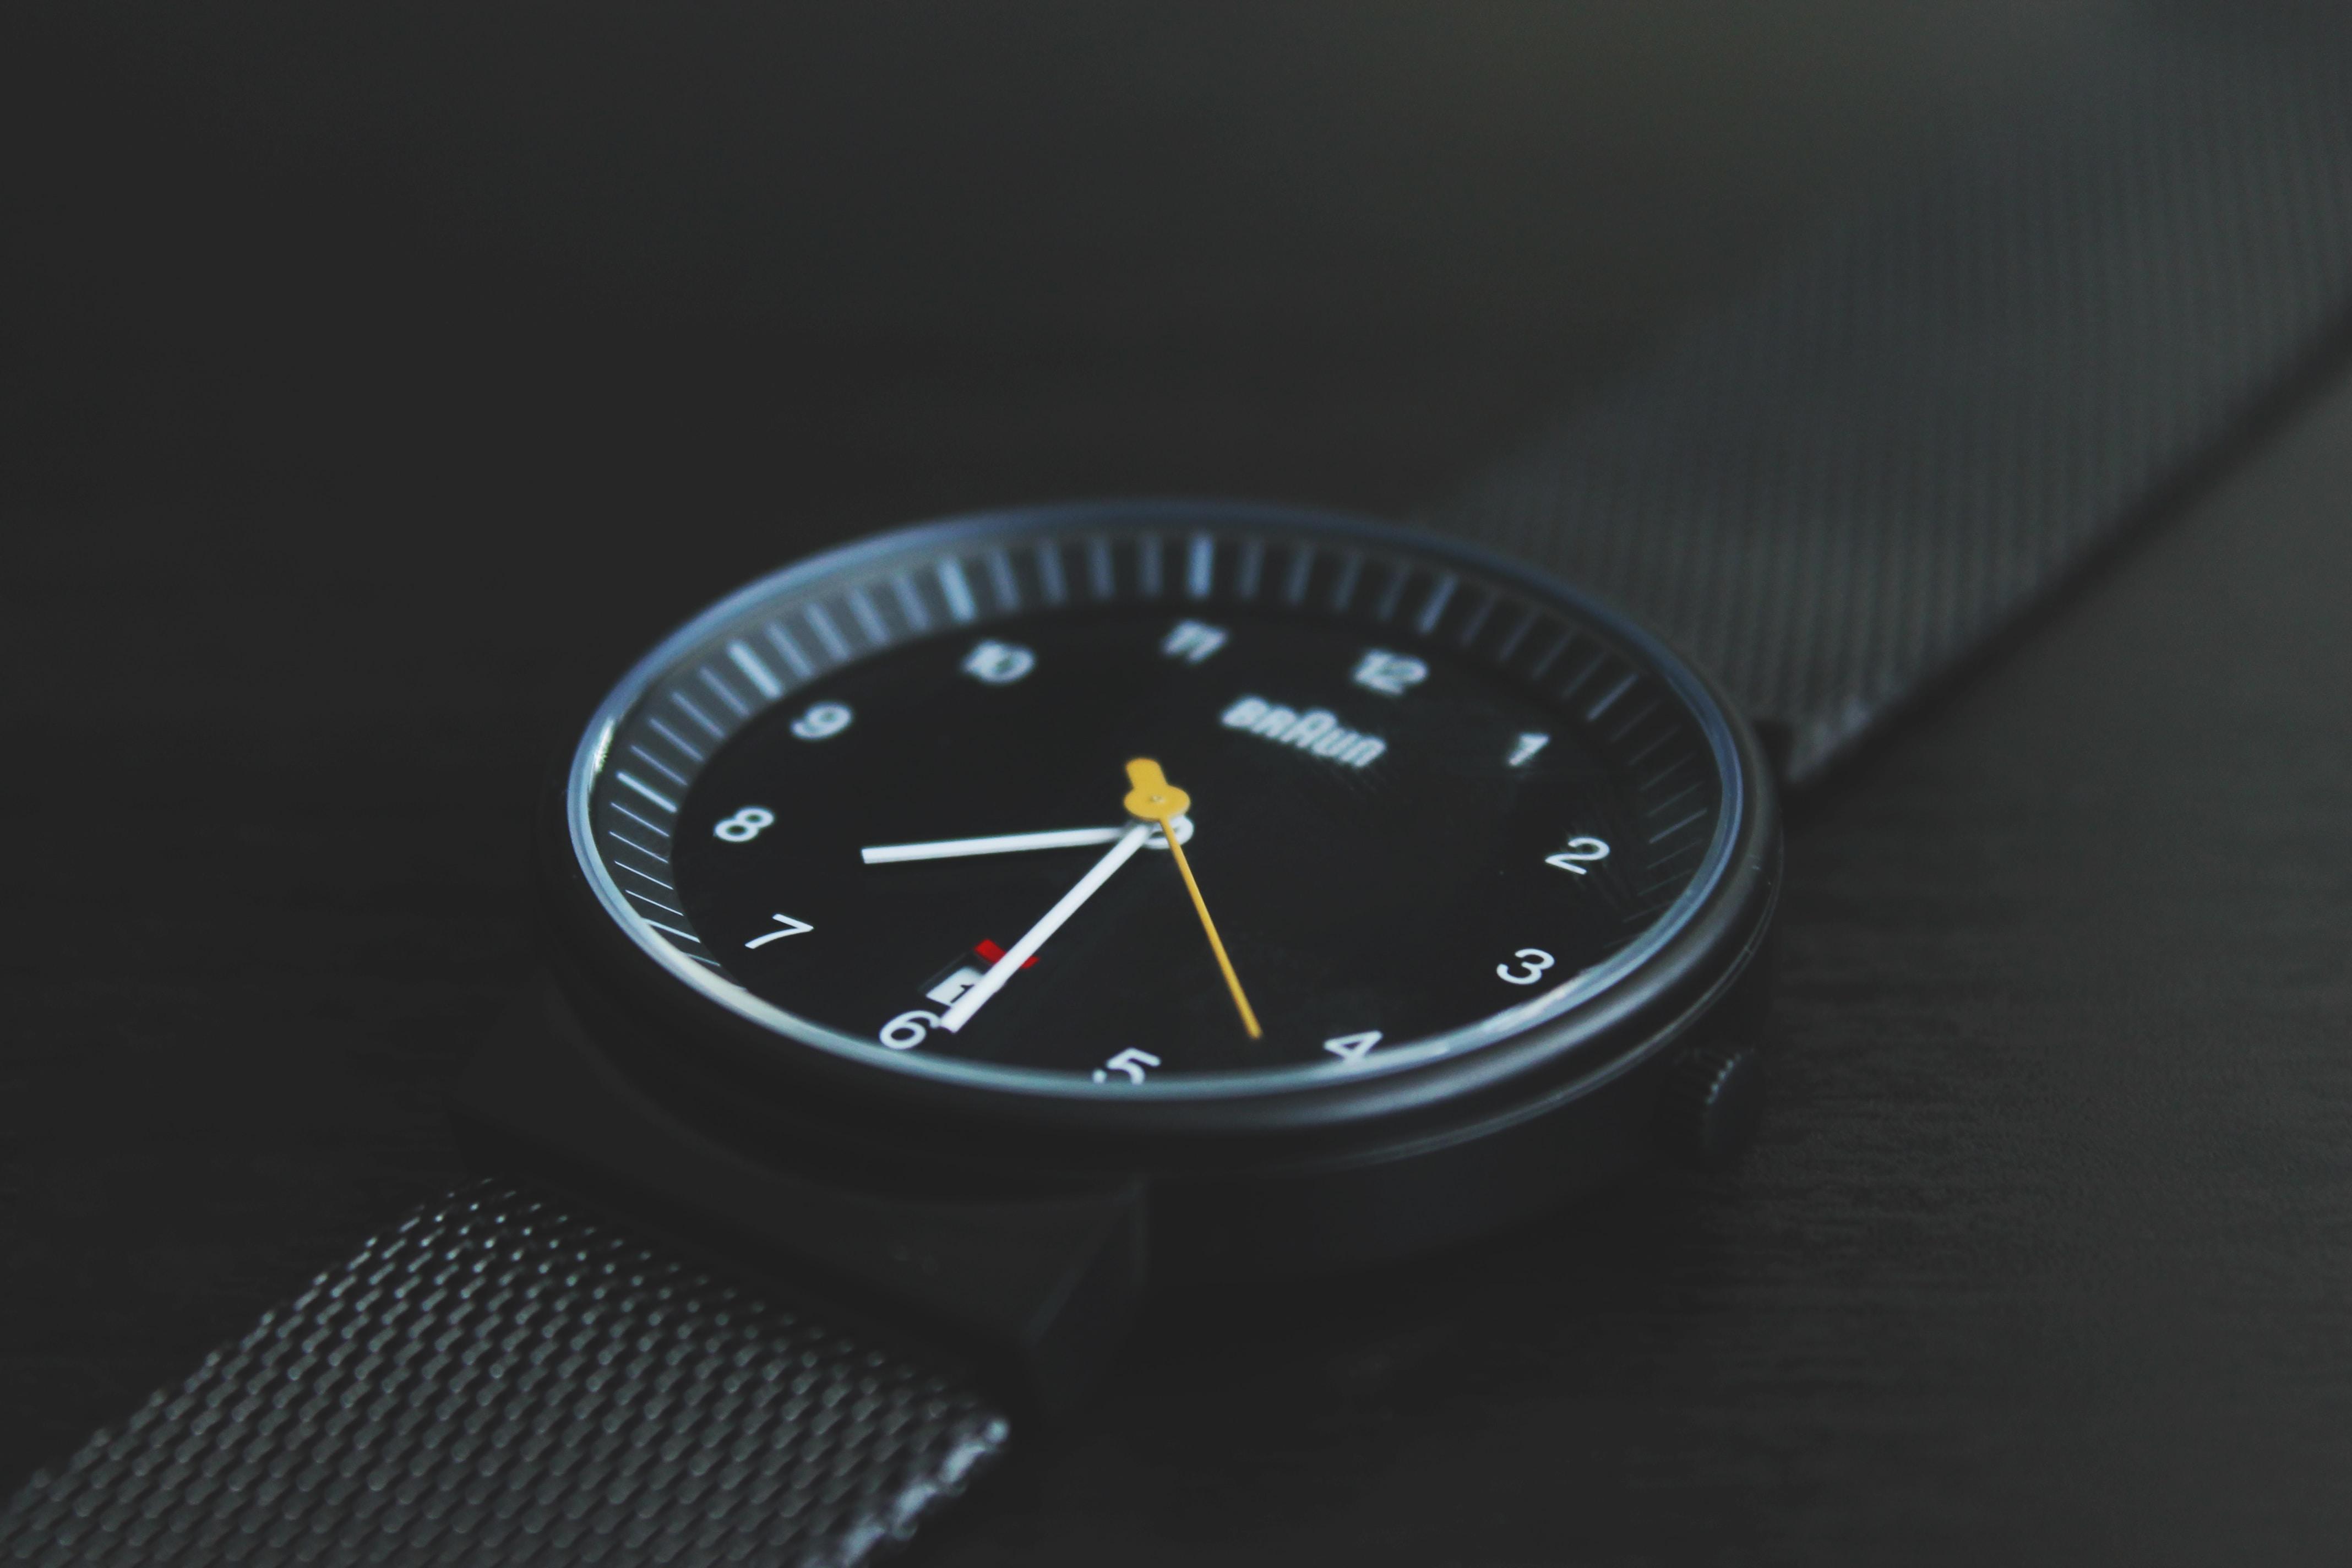 round black Braun analog watch with black band at 7:30